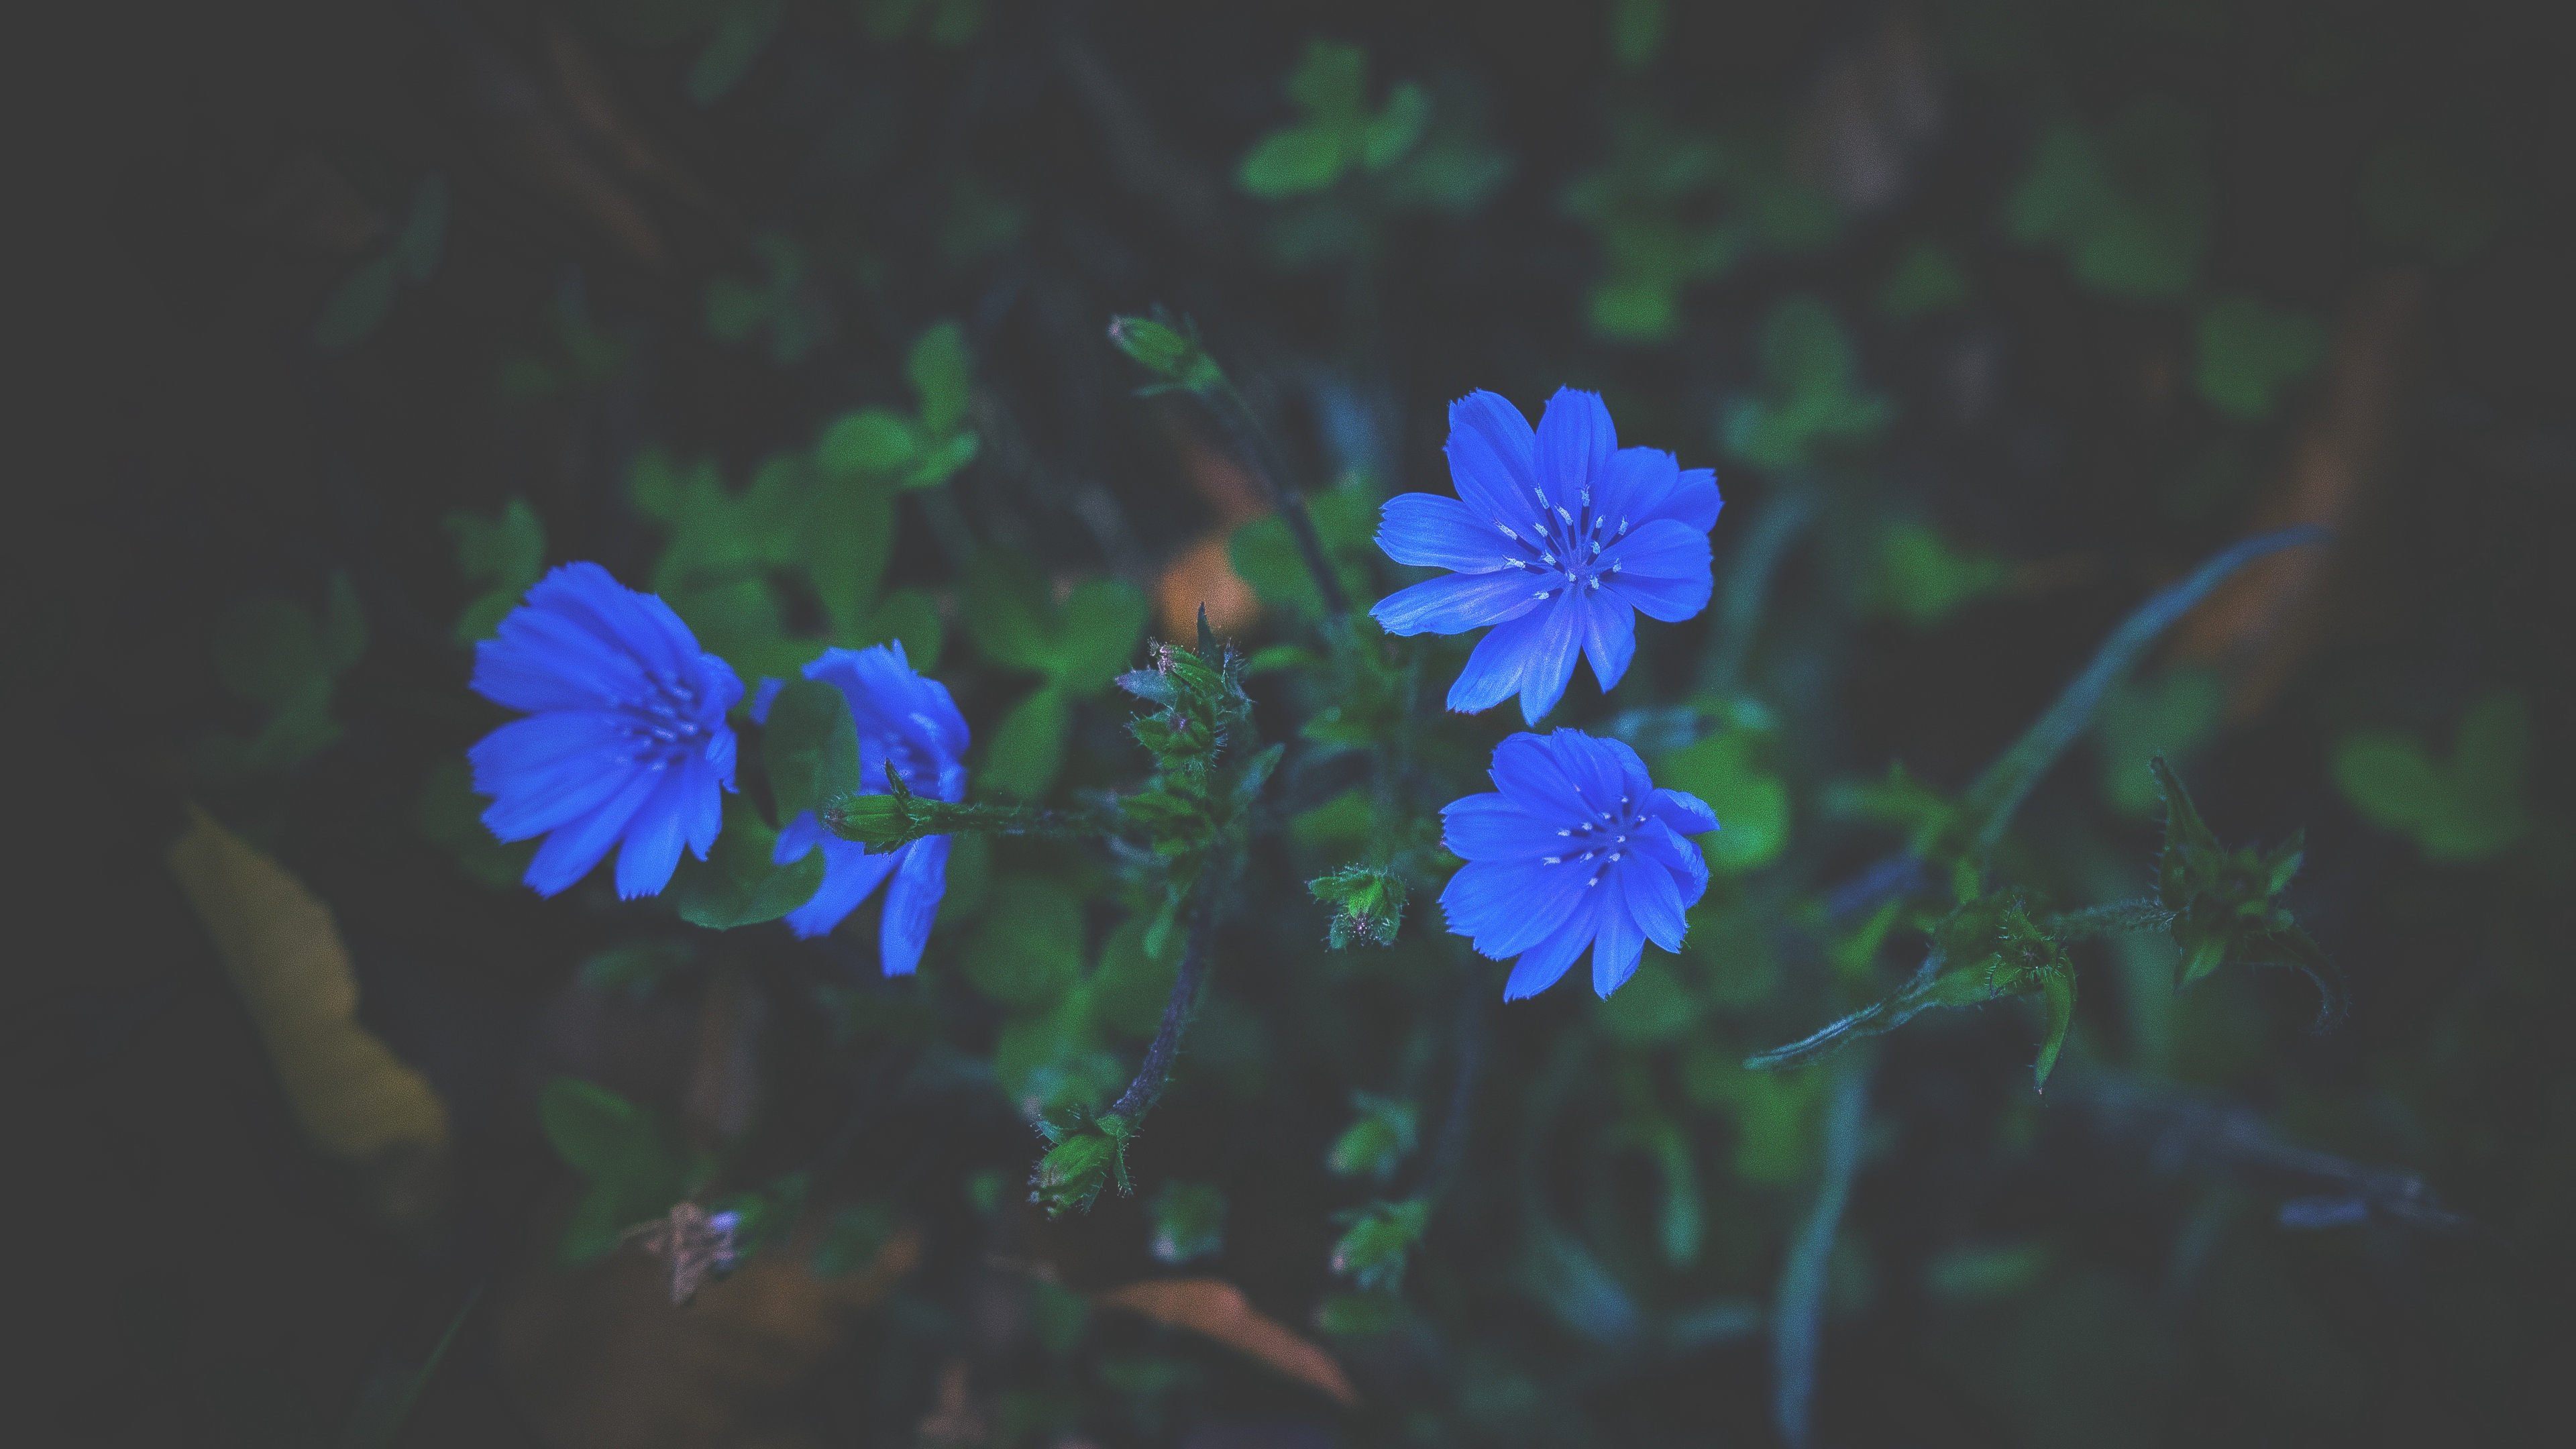 flowers grass blue 4k 1540574458 - flowers, grass, blue 4k - Grass, Flowers, blue